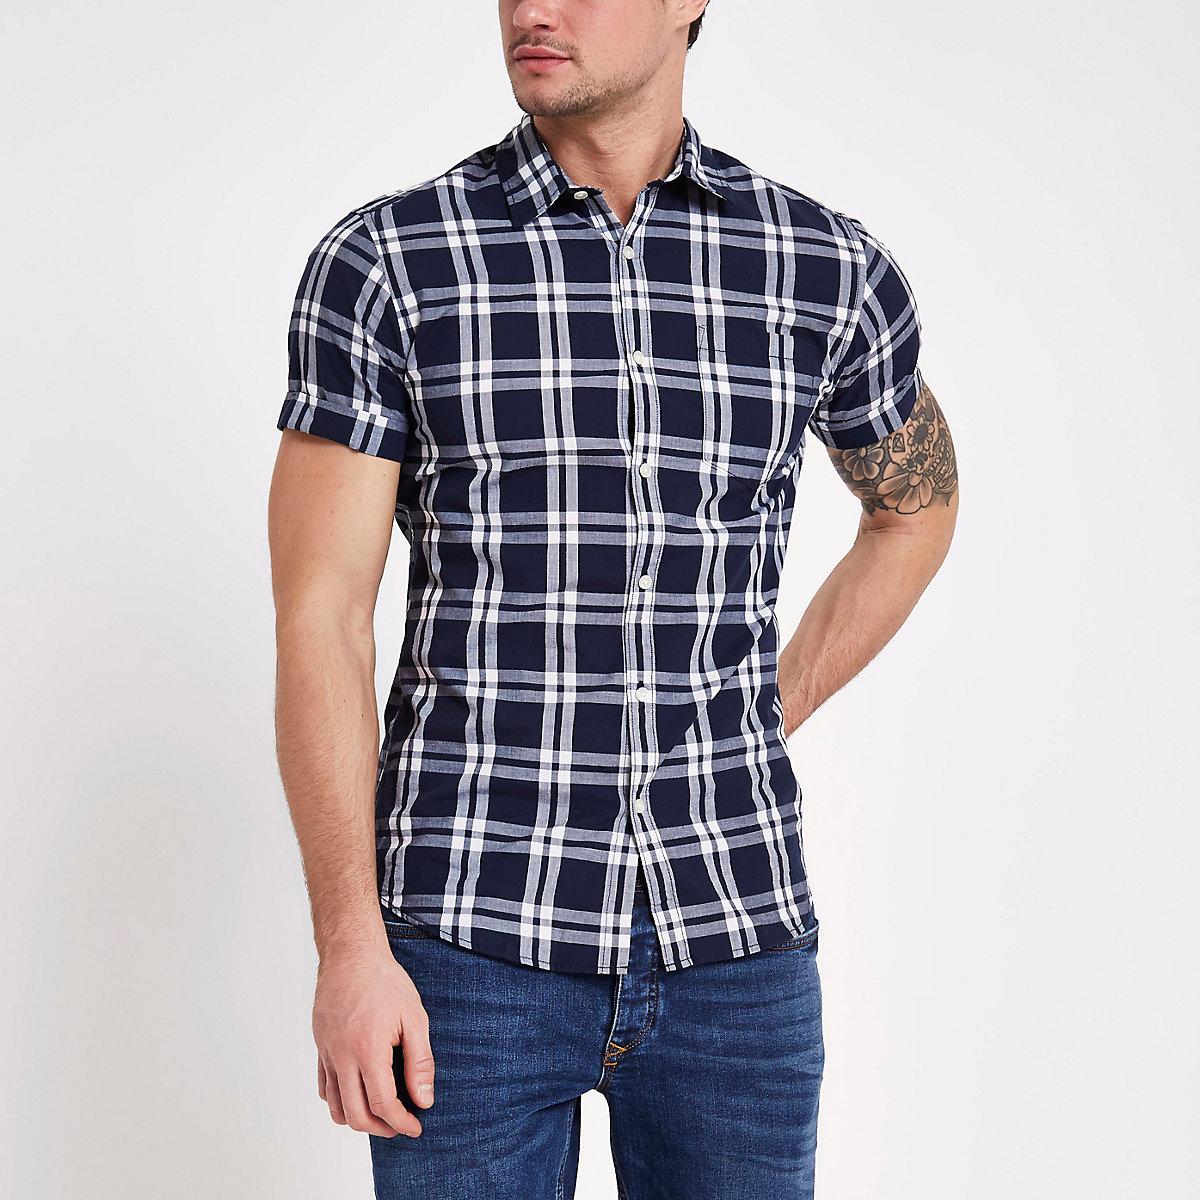 Jack & Jones Originals - Marineblauw geruit overhemd